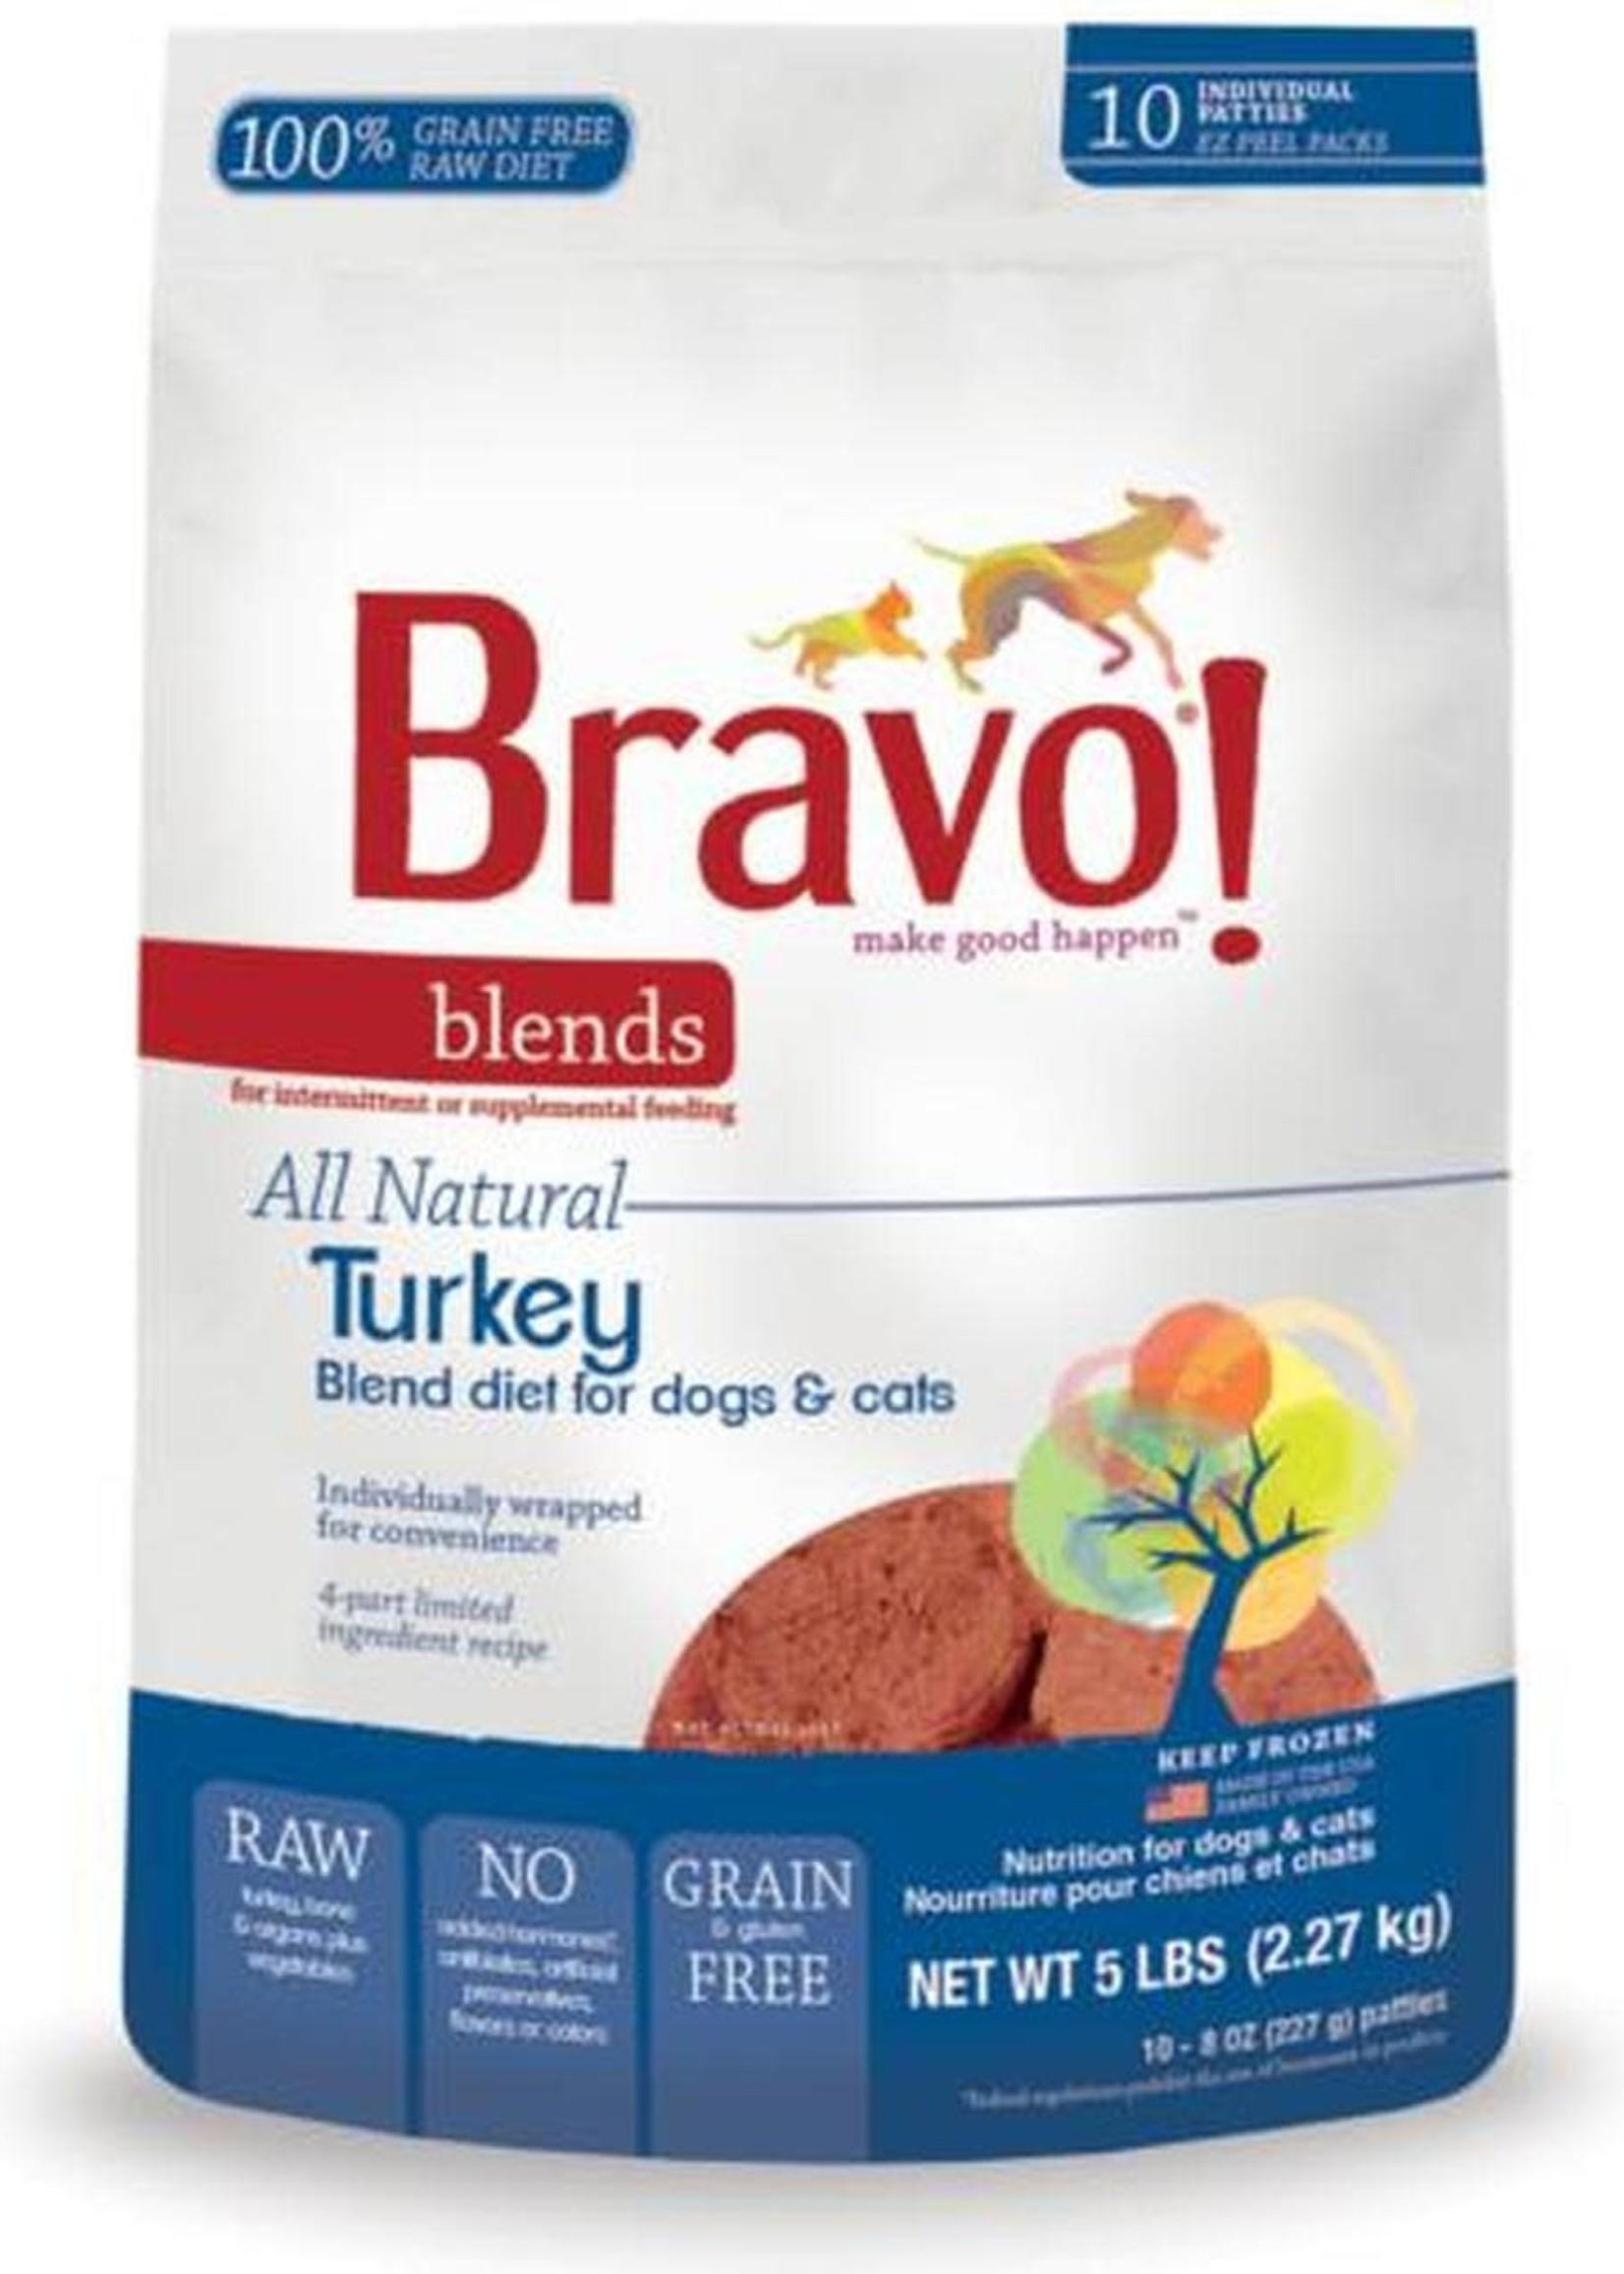 Bravo! Bravo! Dog Food Blends Frozen Turkey Burgers 5 lbs